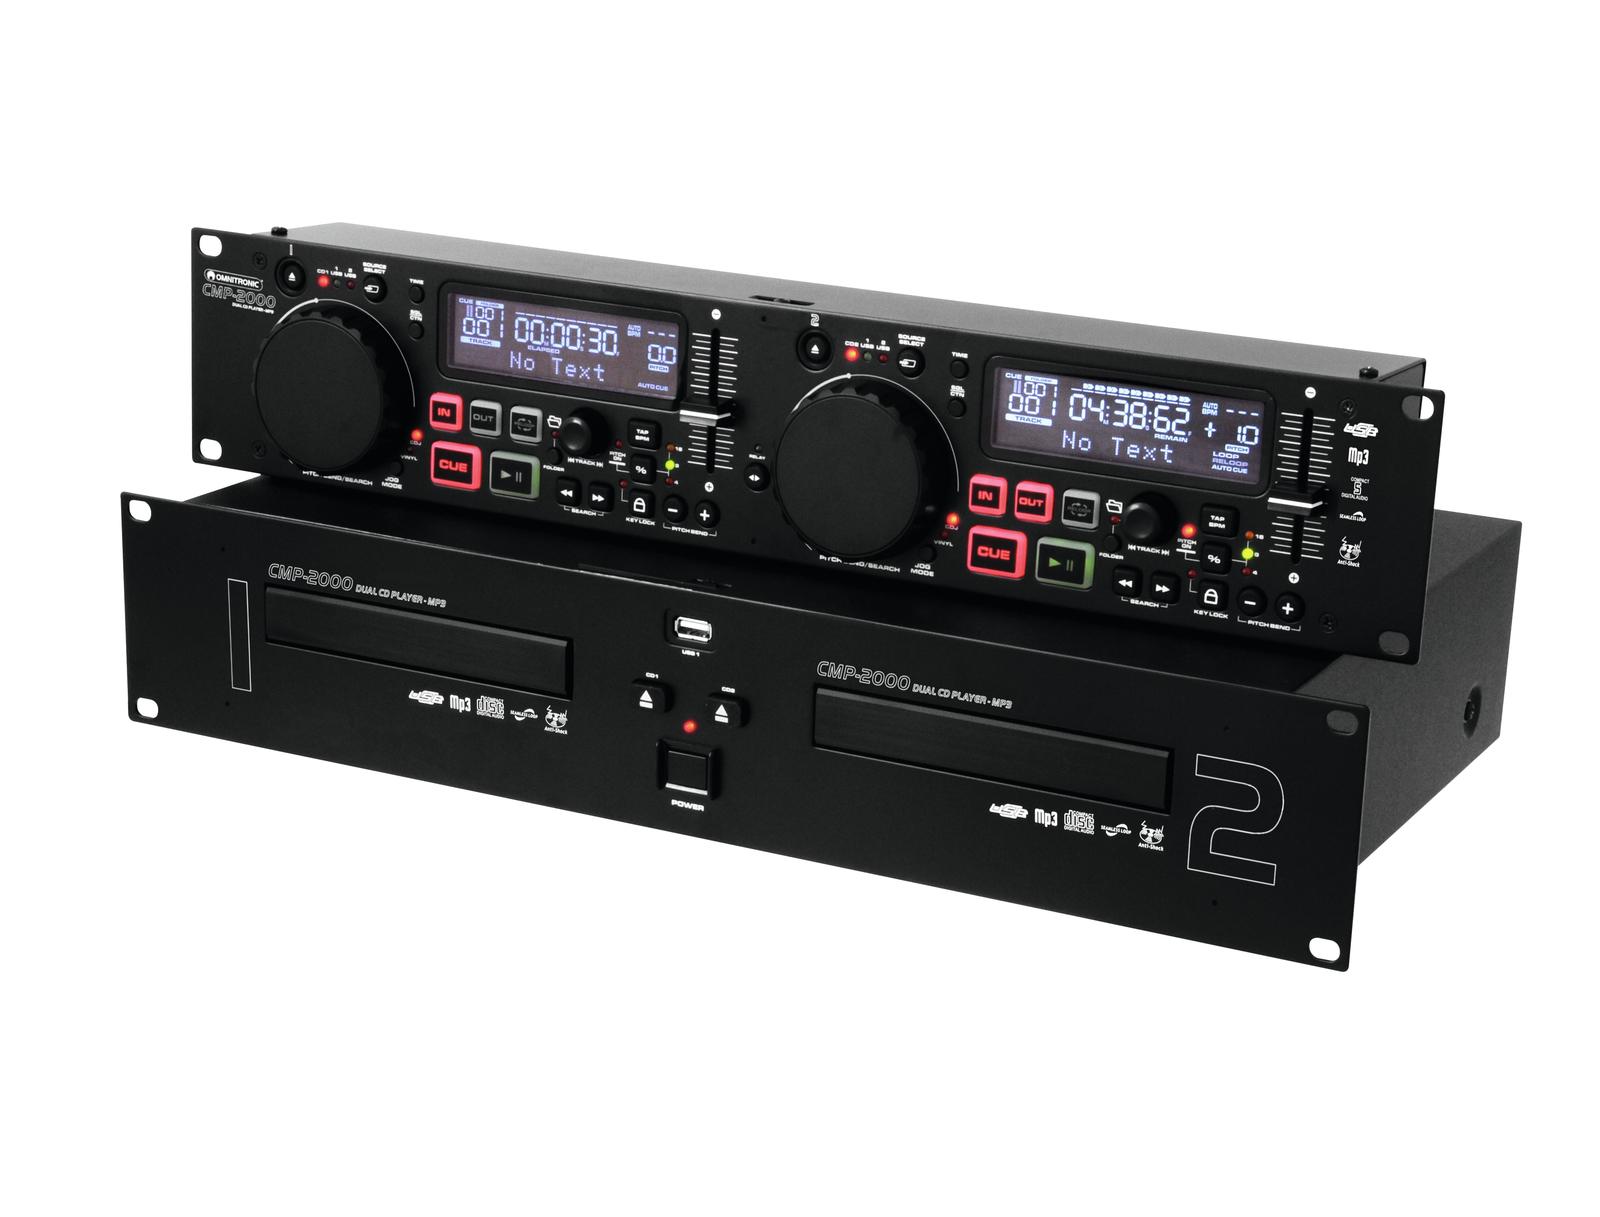 OMNITRONIC CMP-2000 Dual-CD-MP3-Player